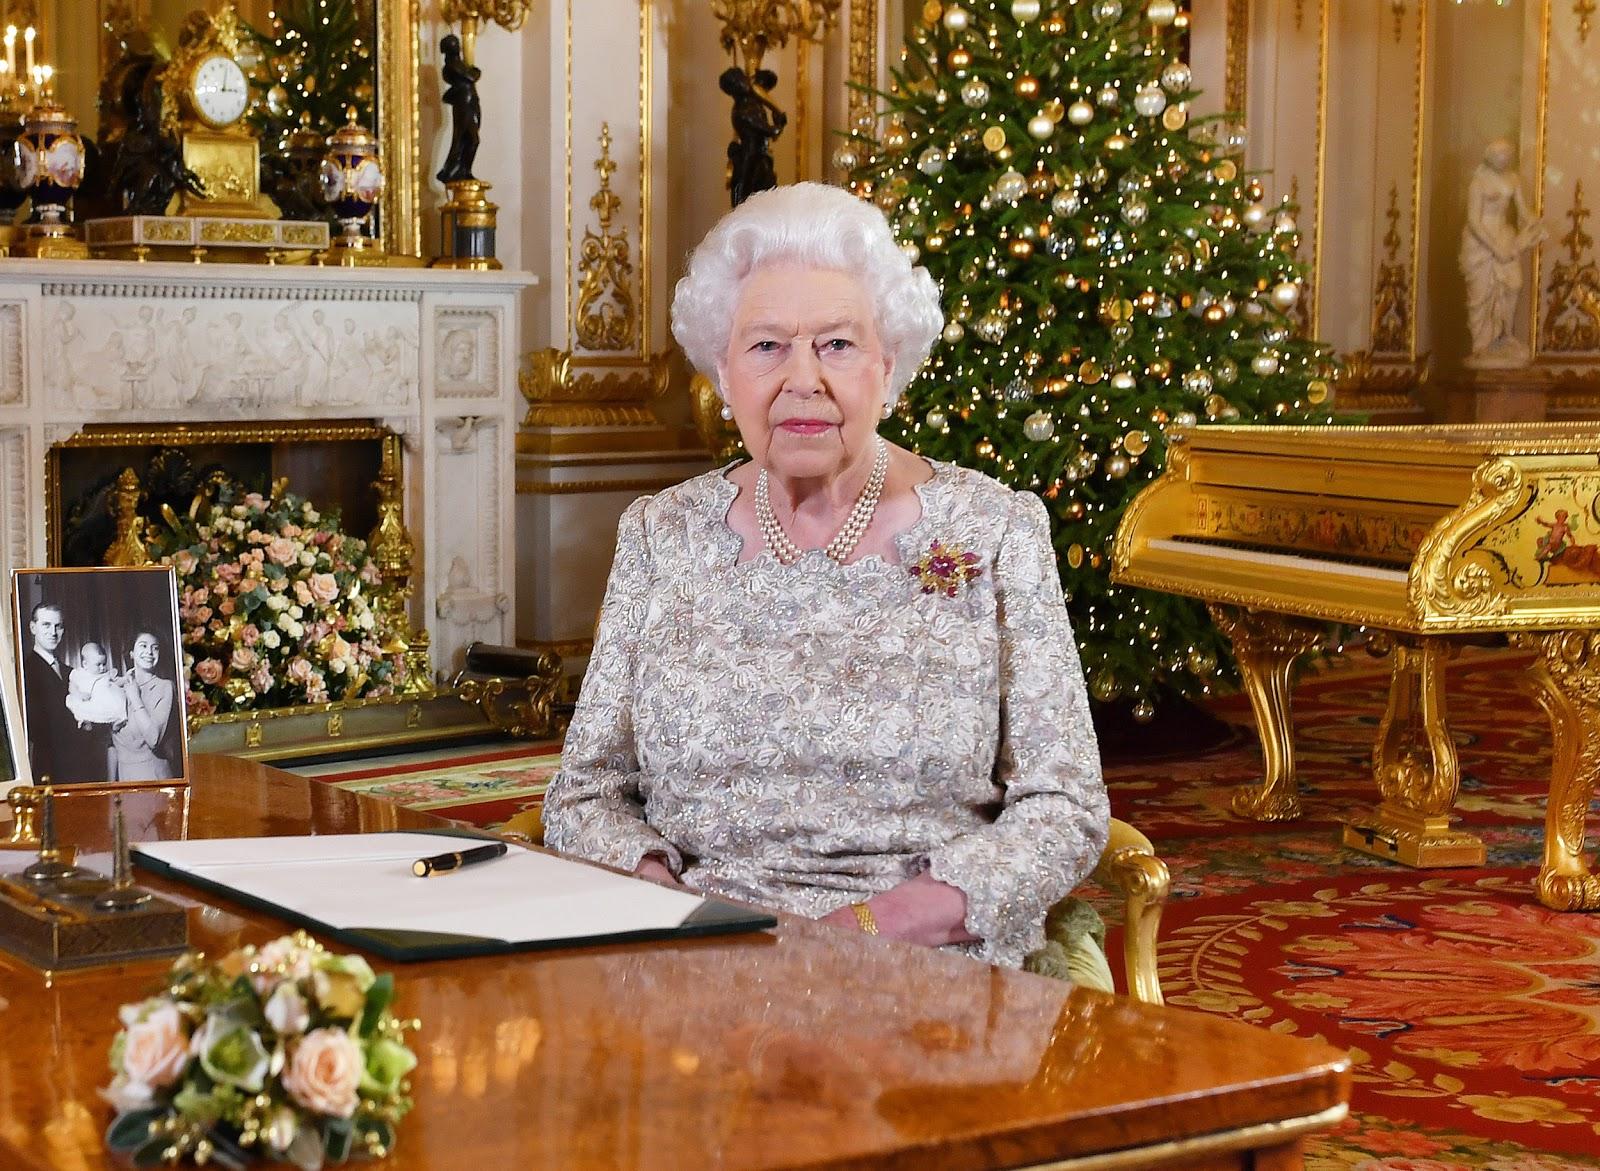 Queen Elizabeth II Welcomes Prince Harry and Meghan Markle's Baby